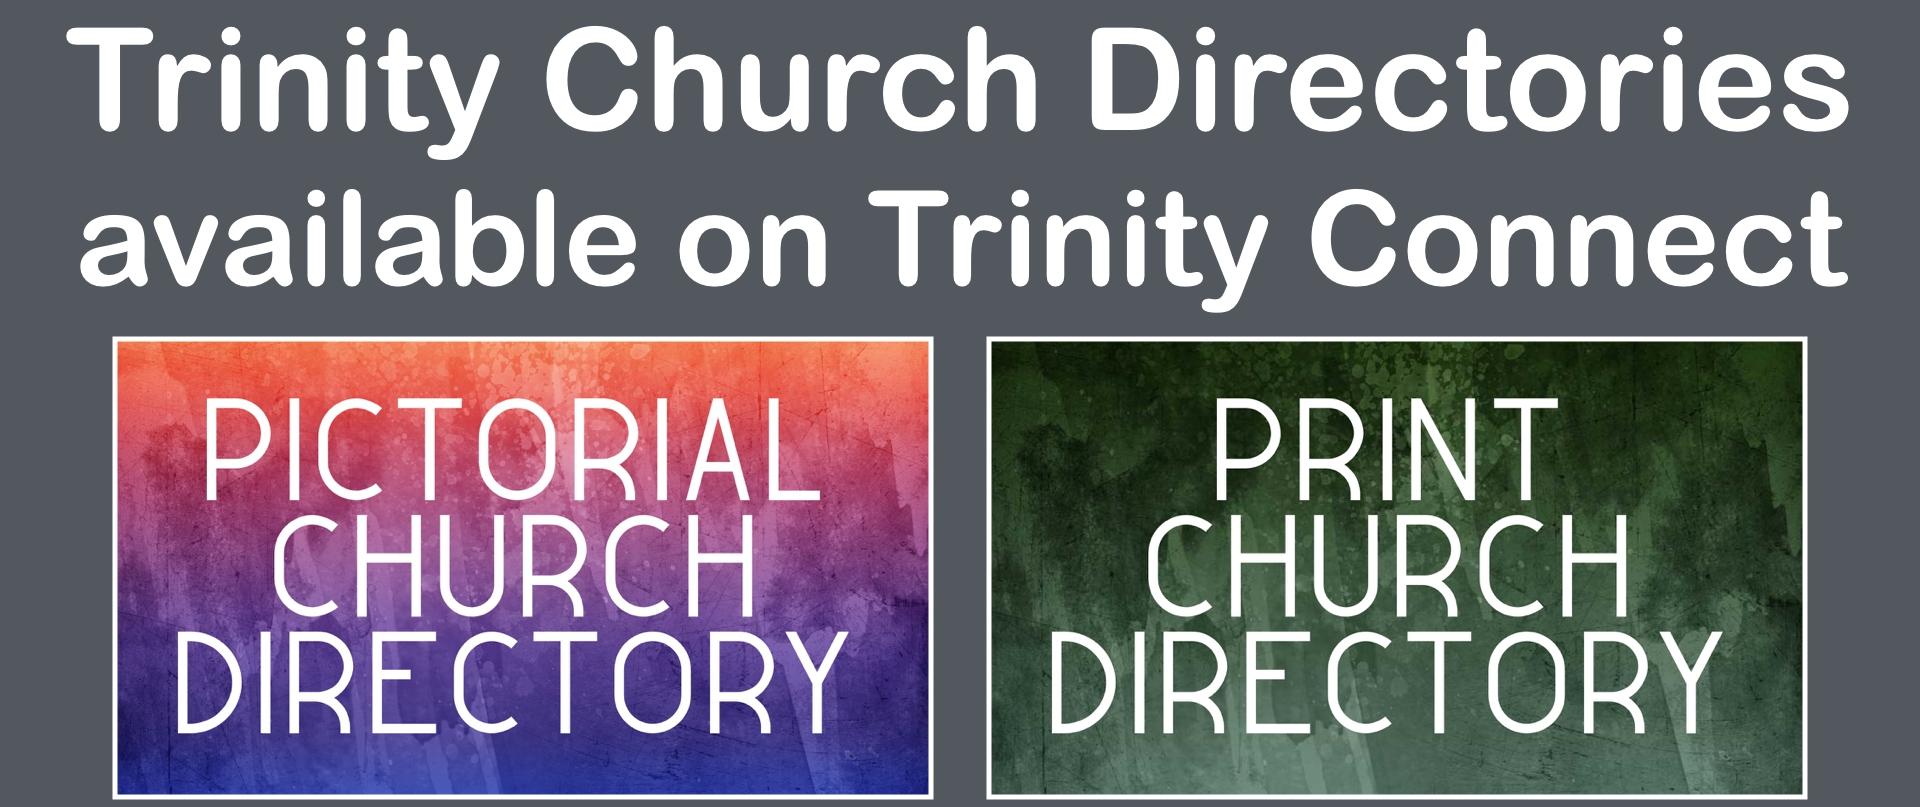 2017.06.11_ChurchDirectories.001.jpeg